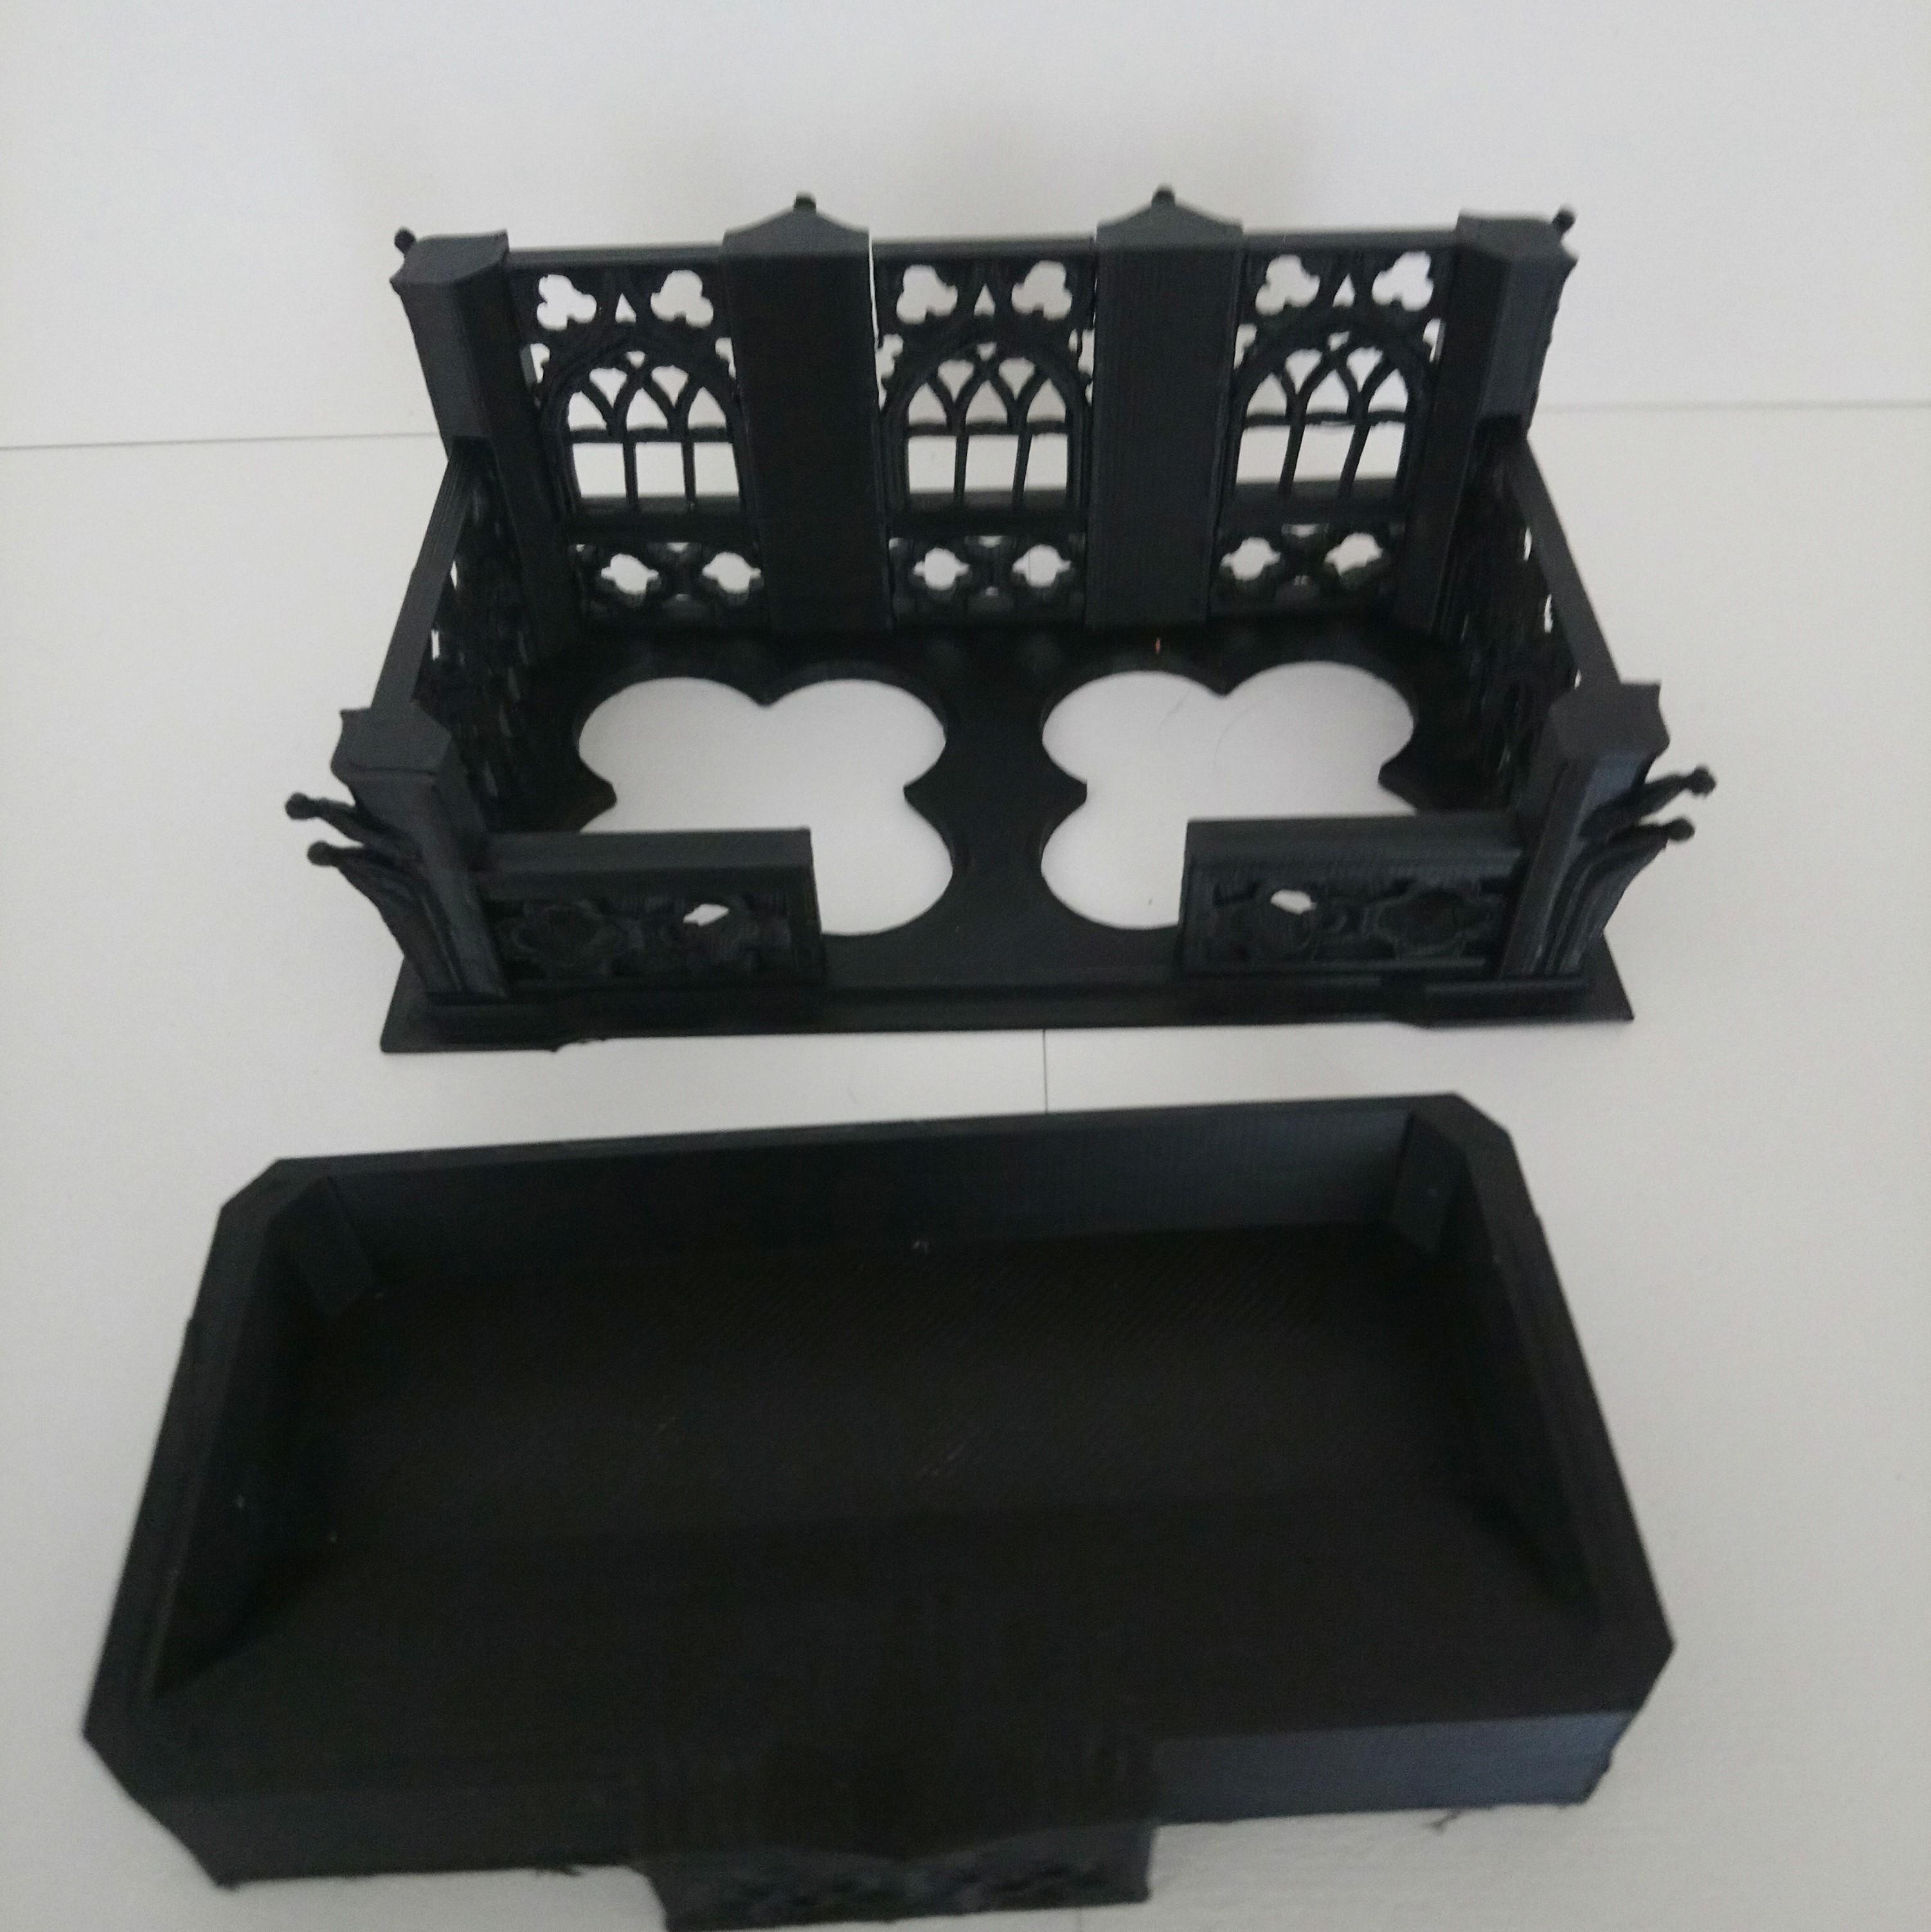 DSC_0654.JPG Download free STL file gothic inspired business card holder • 3D printing template, hicksadder